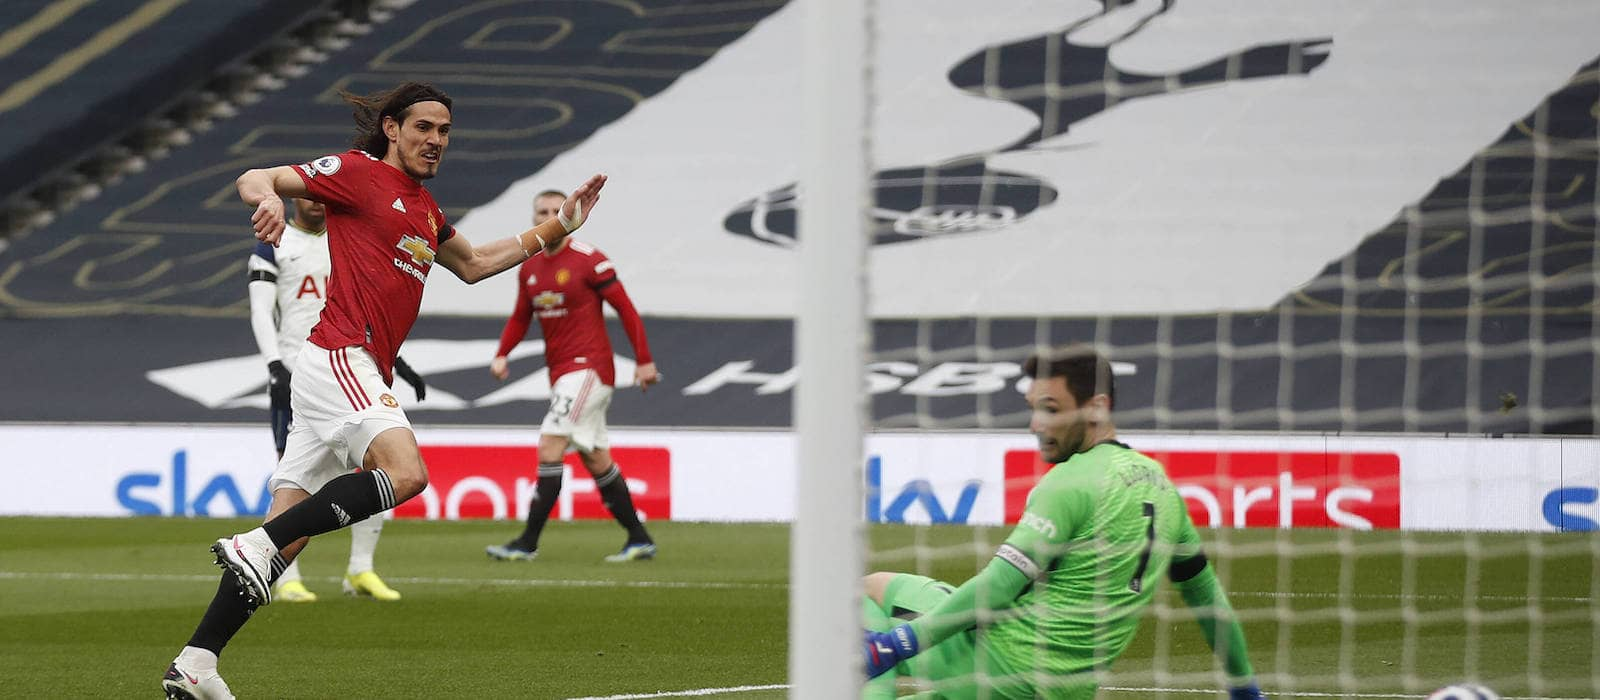 Edinson Cavani reminds Manchester United how good he is vs Tottenham Hotspur